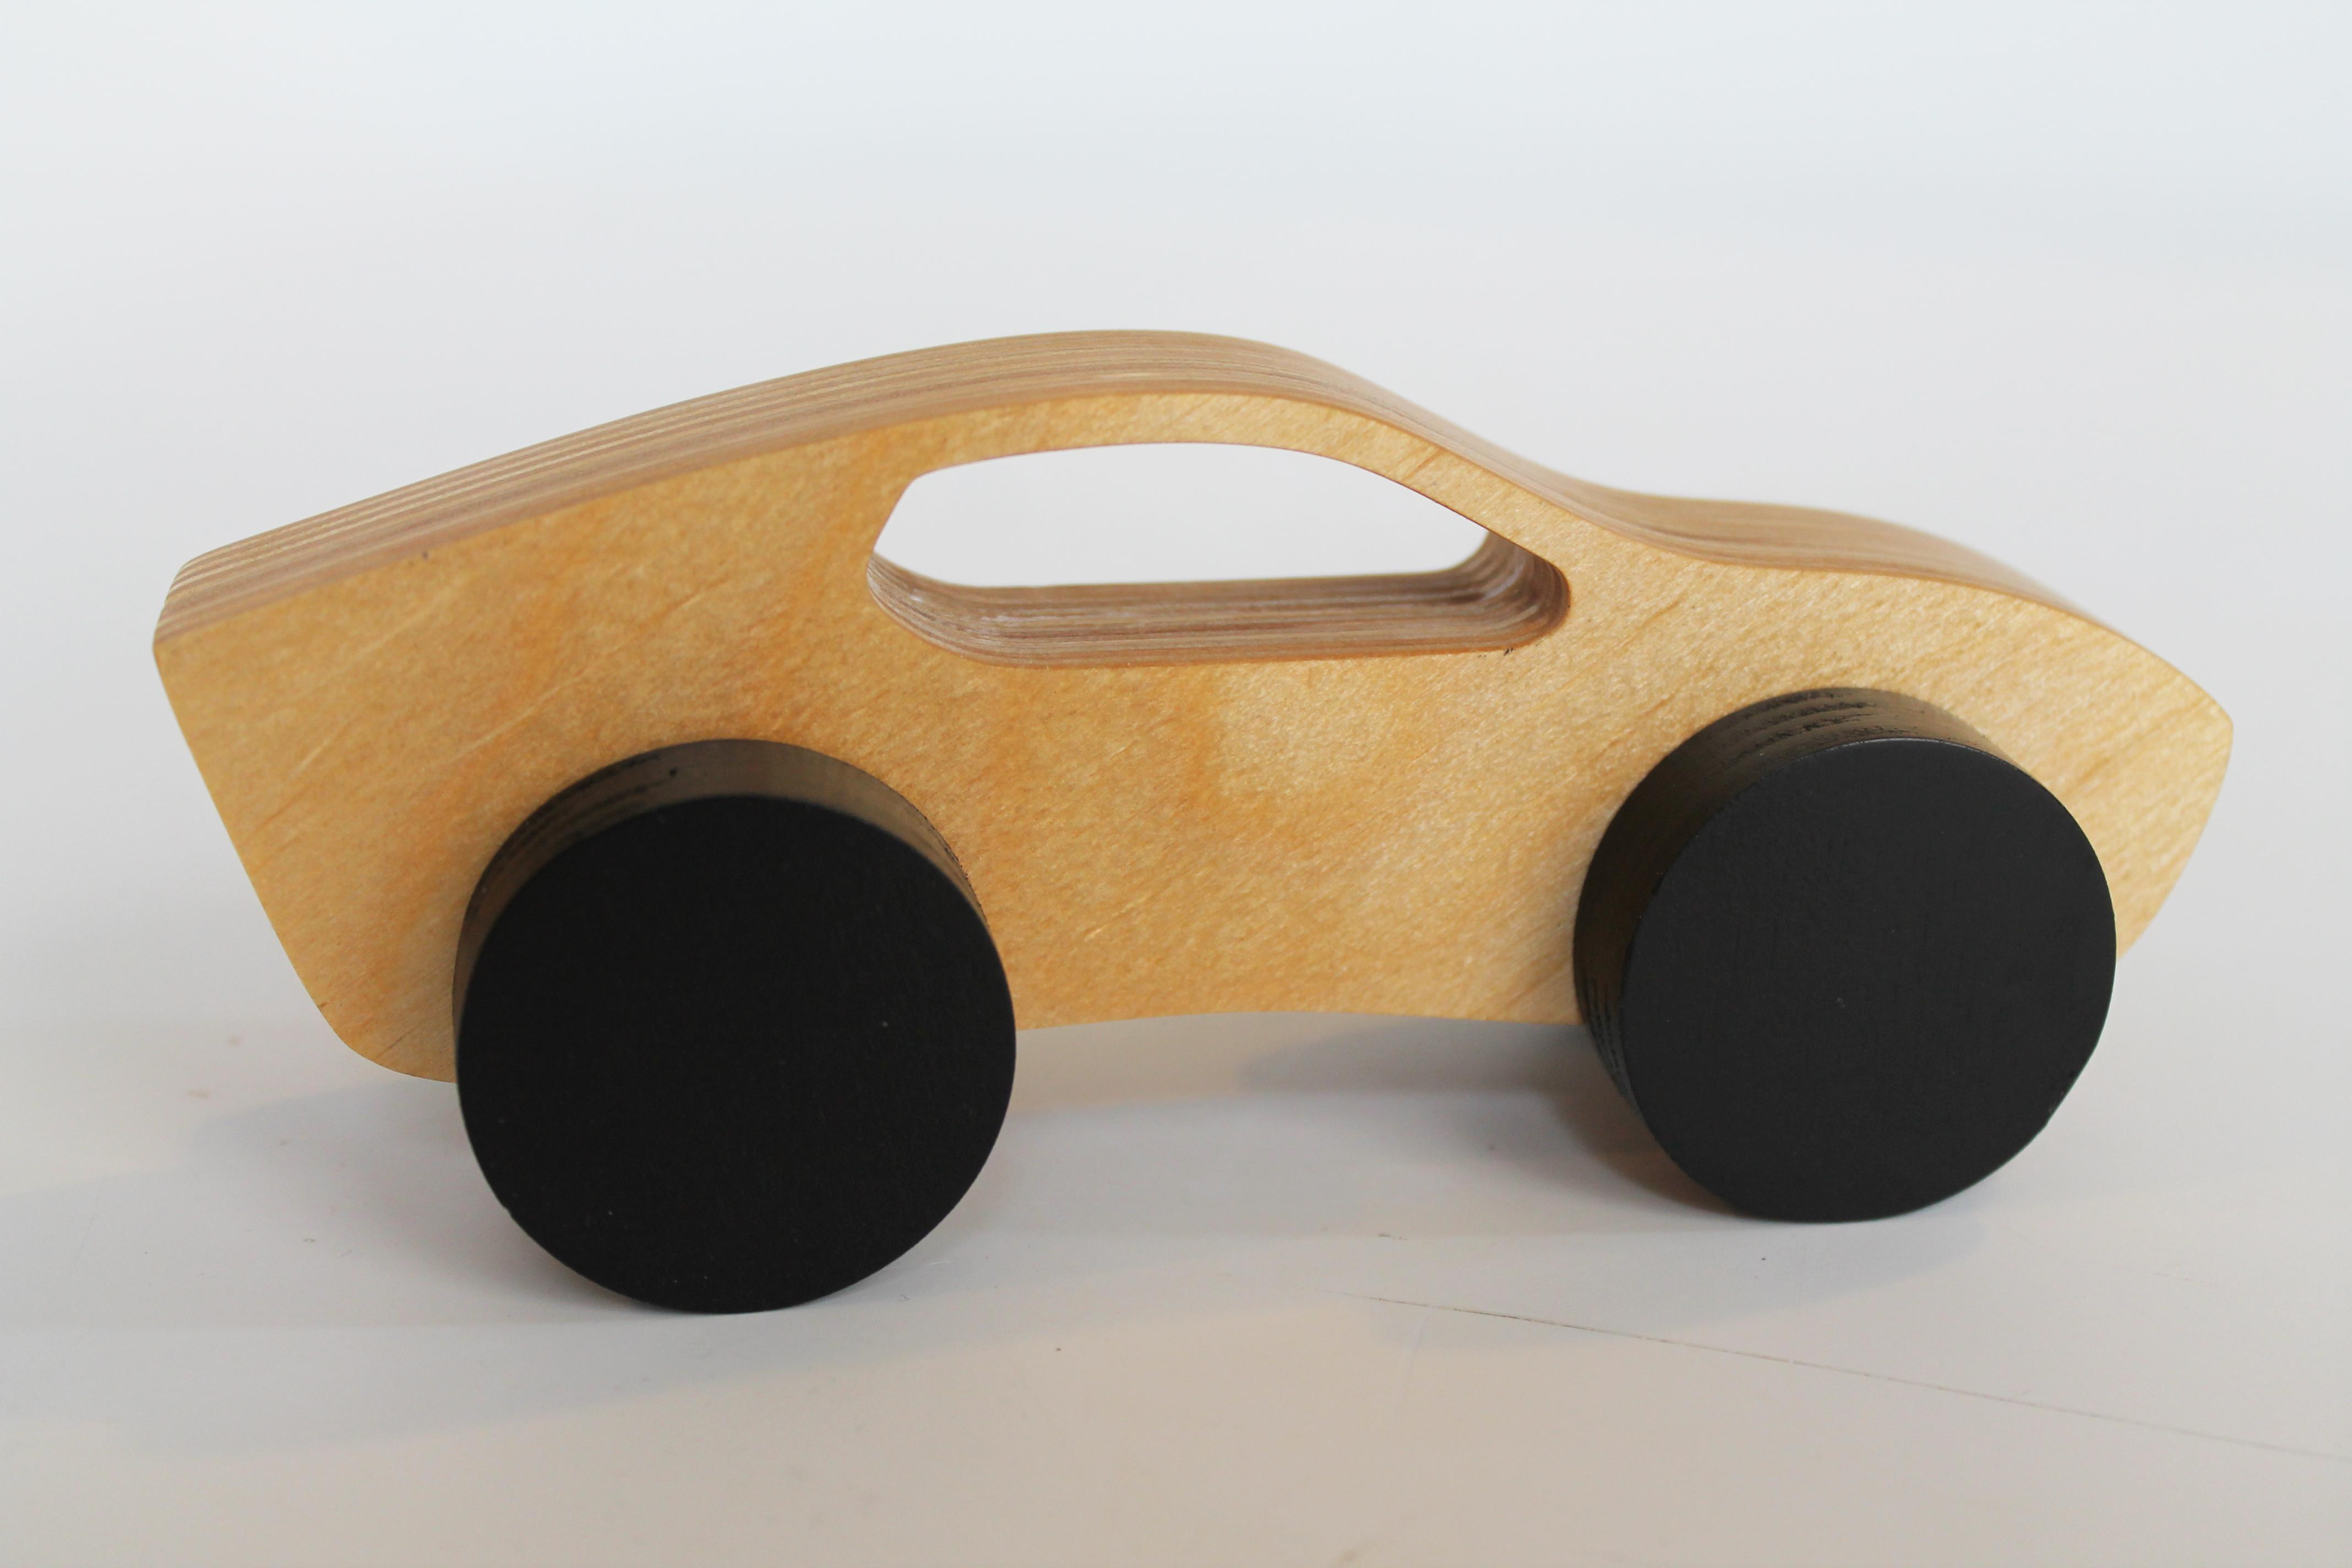 Bantmobile Wooden Toy Car – Bantam Tools